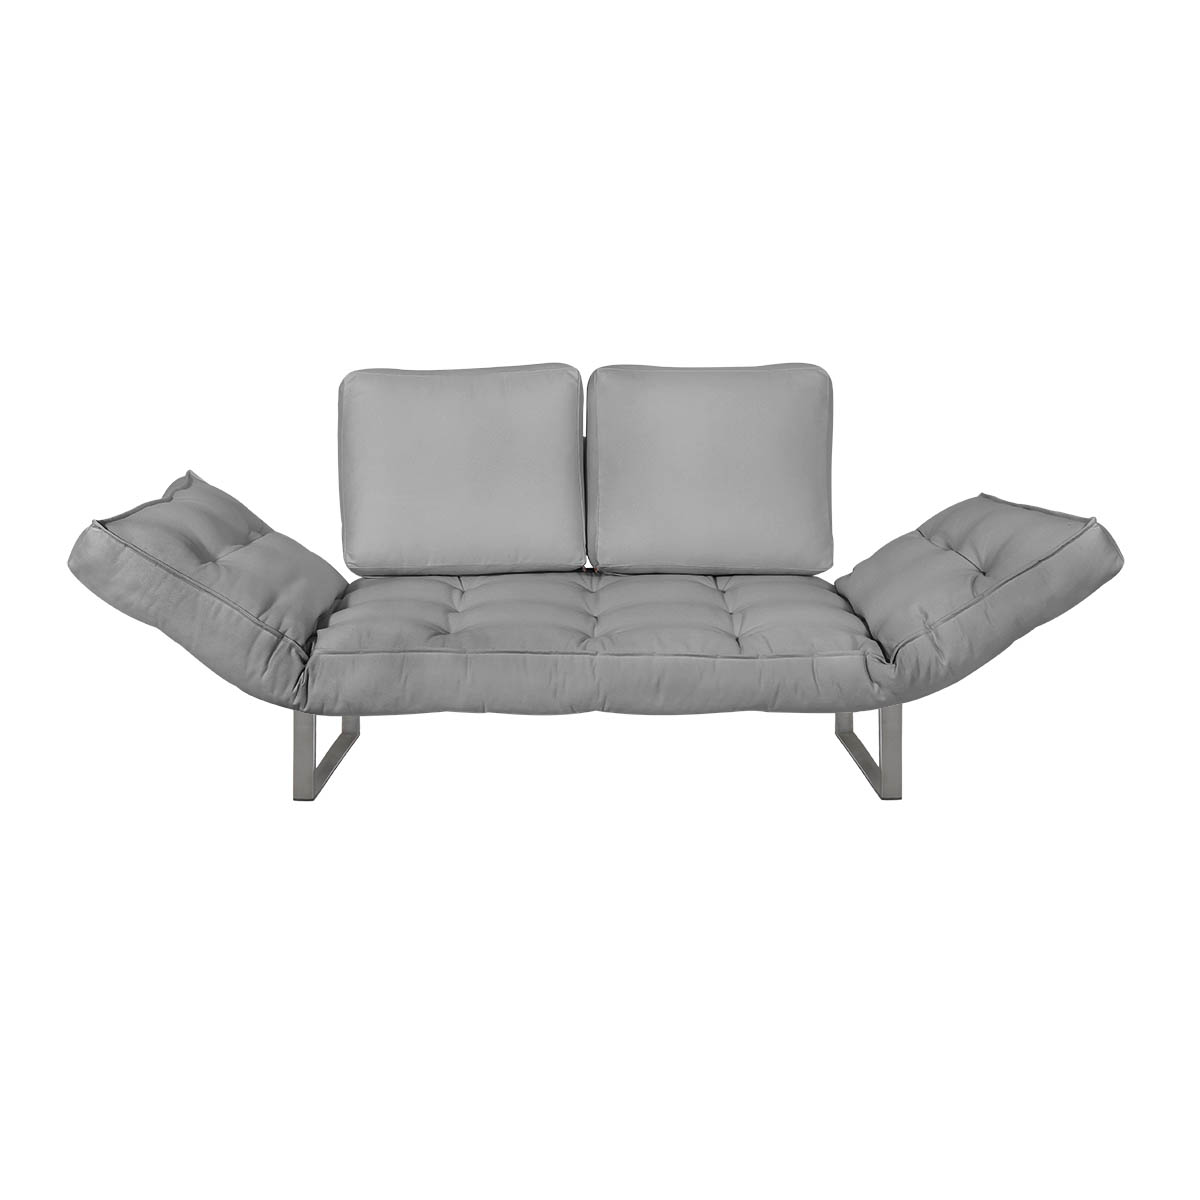 Sofa Cama Solteiro • Futon Company - photo#8